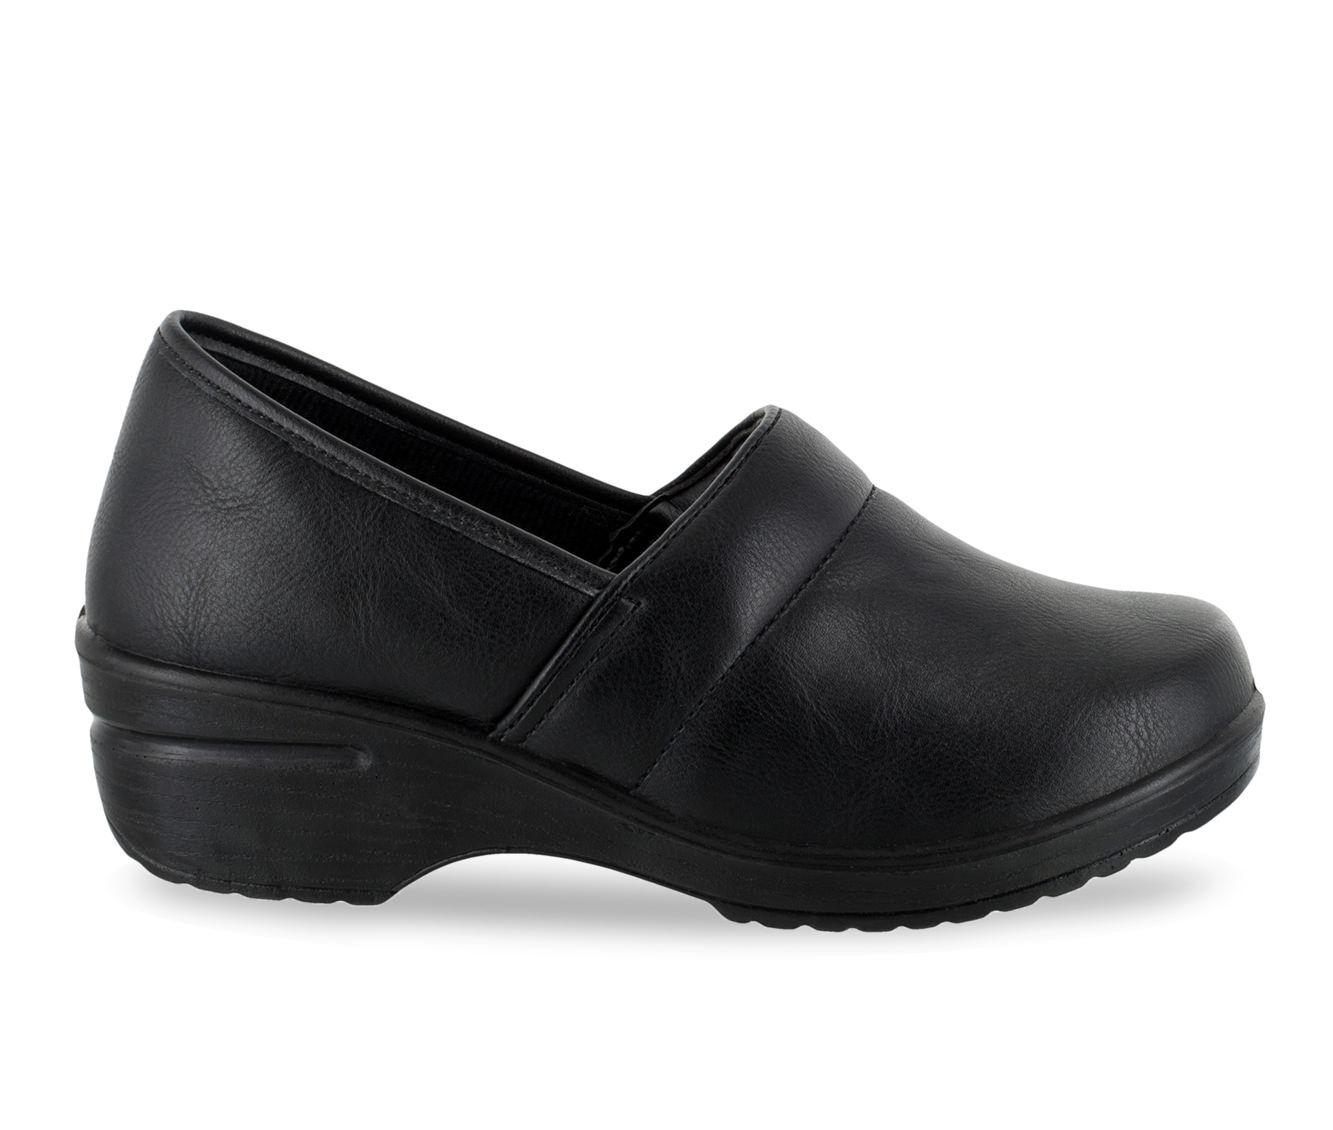 Women's Easy Works by Easy Street Lyndee Slip-Resistant Clogs Black Matte